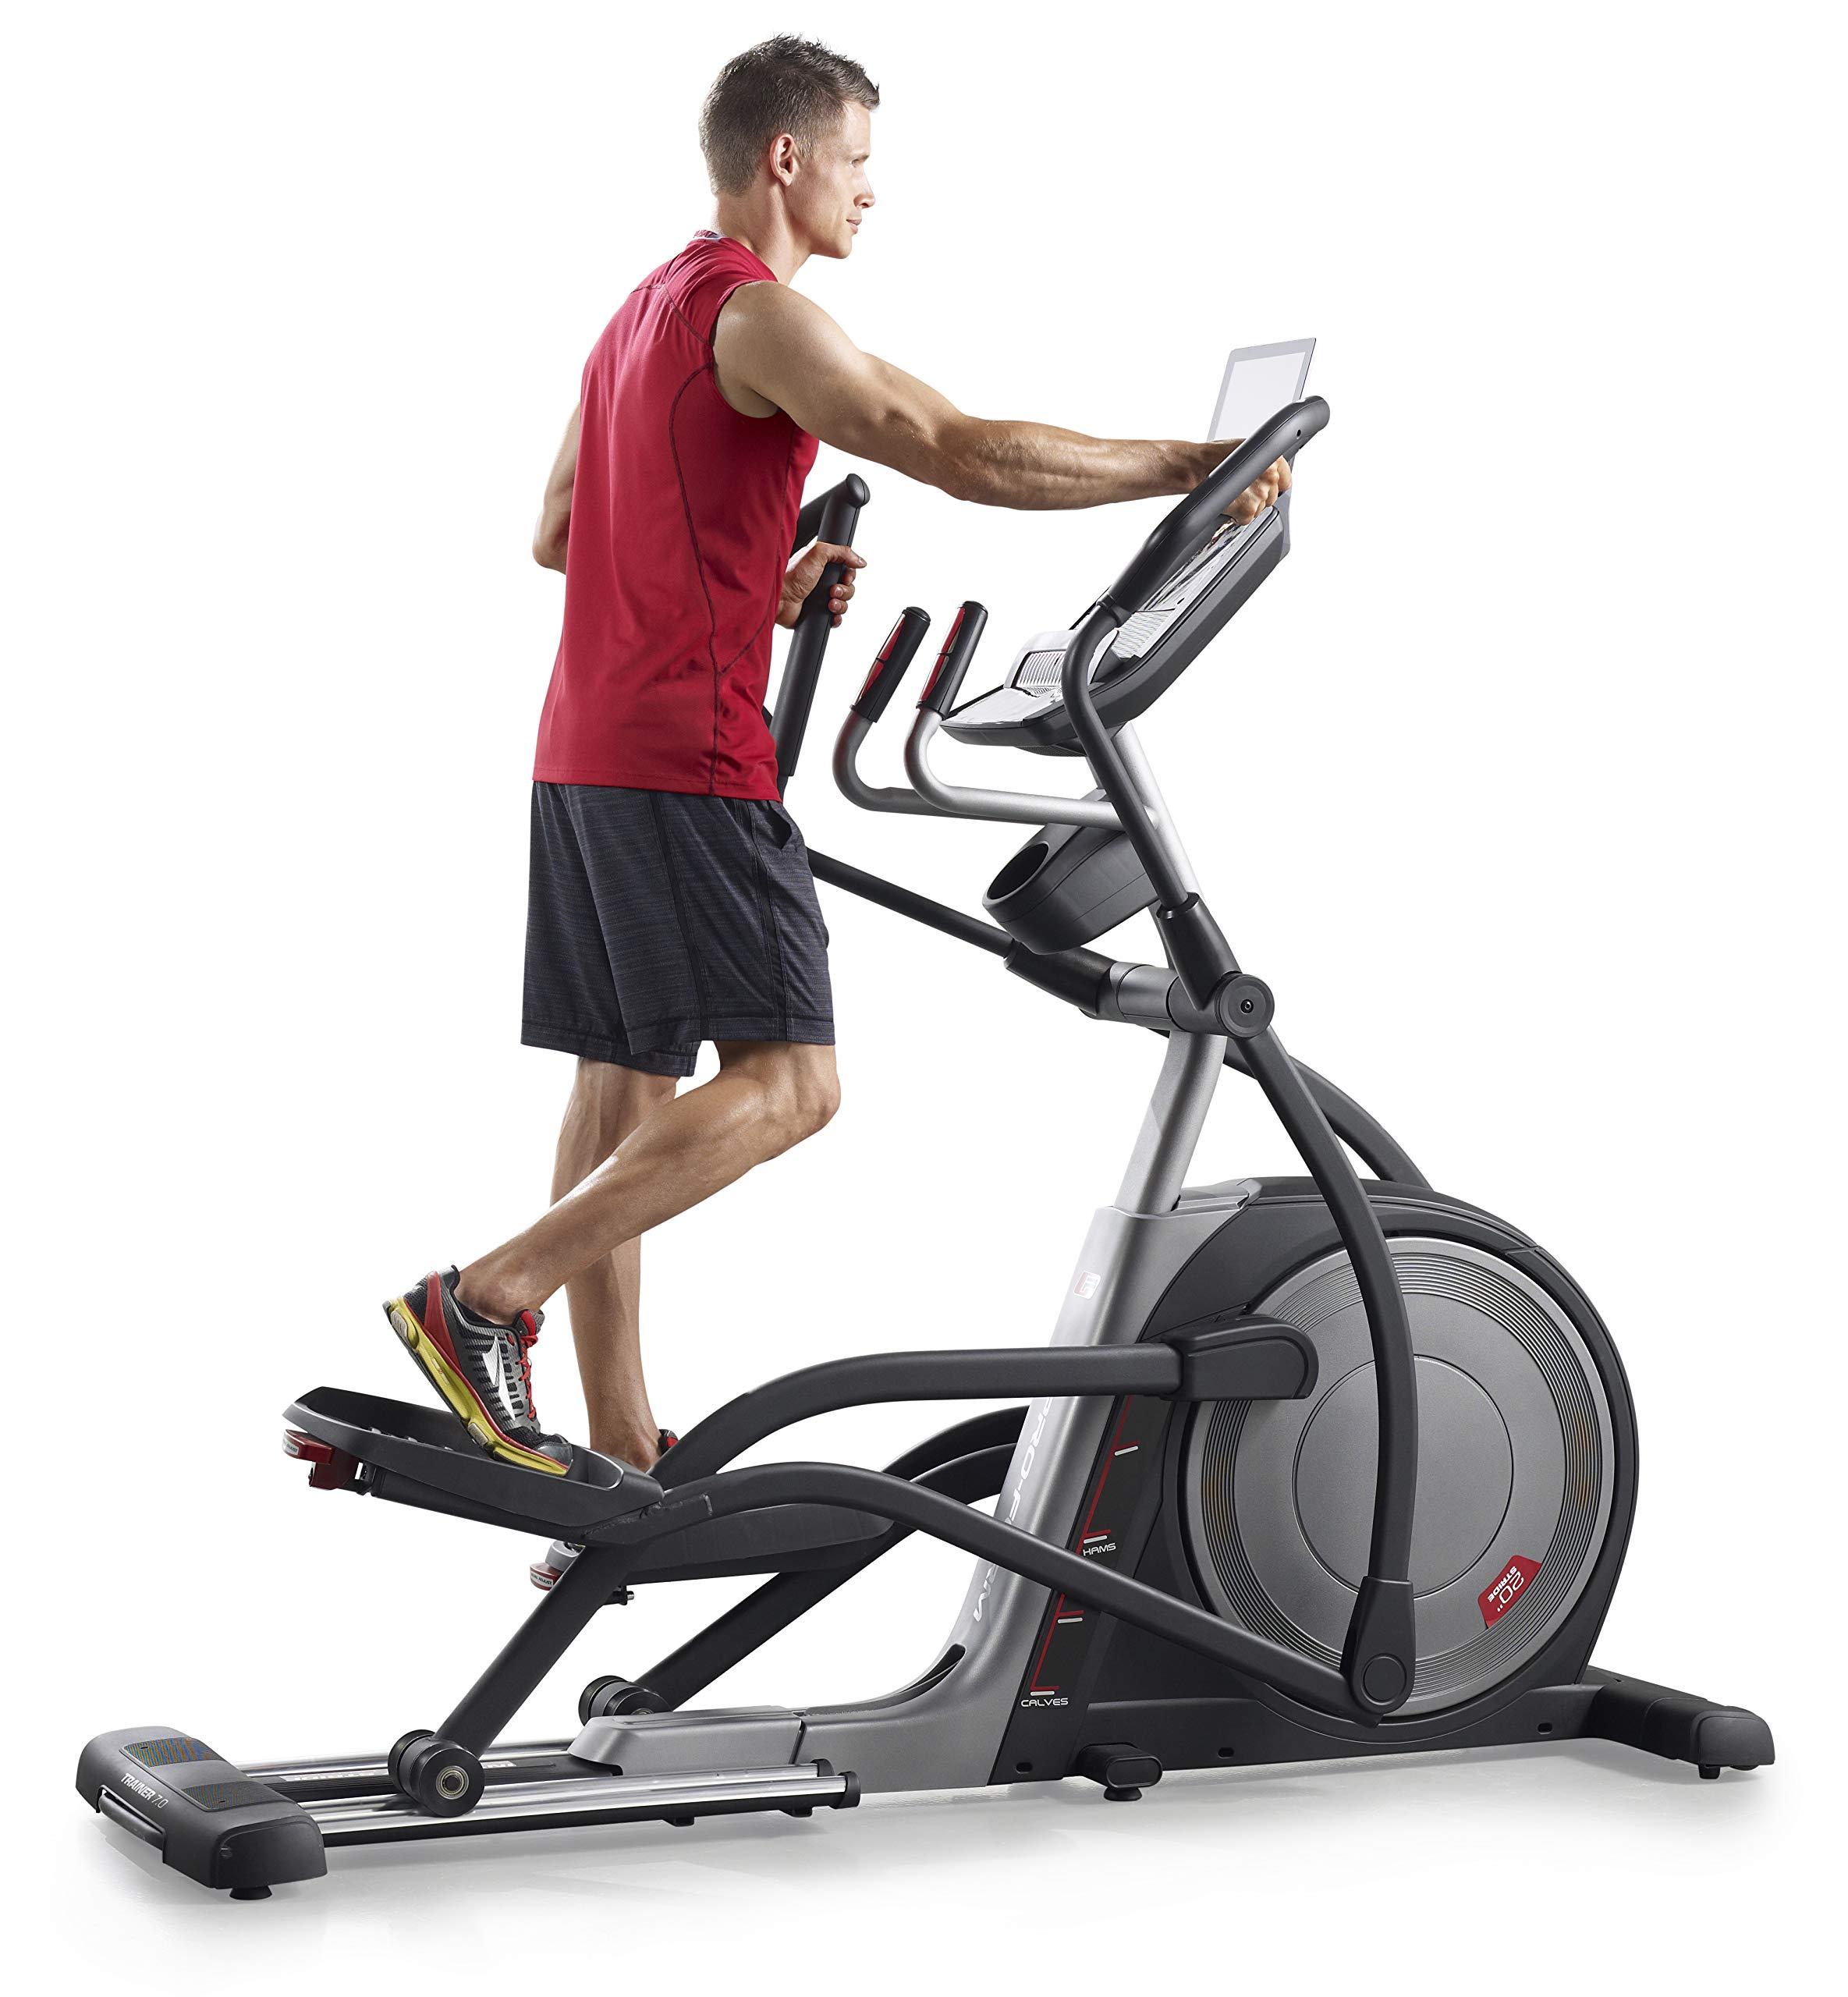 proform endurance 420 E man working out